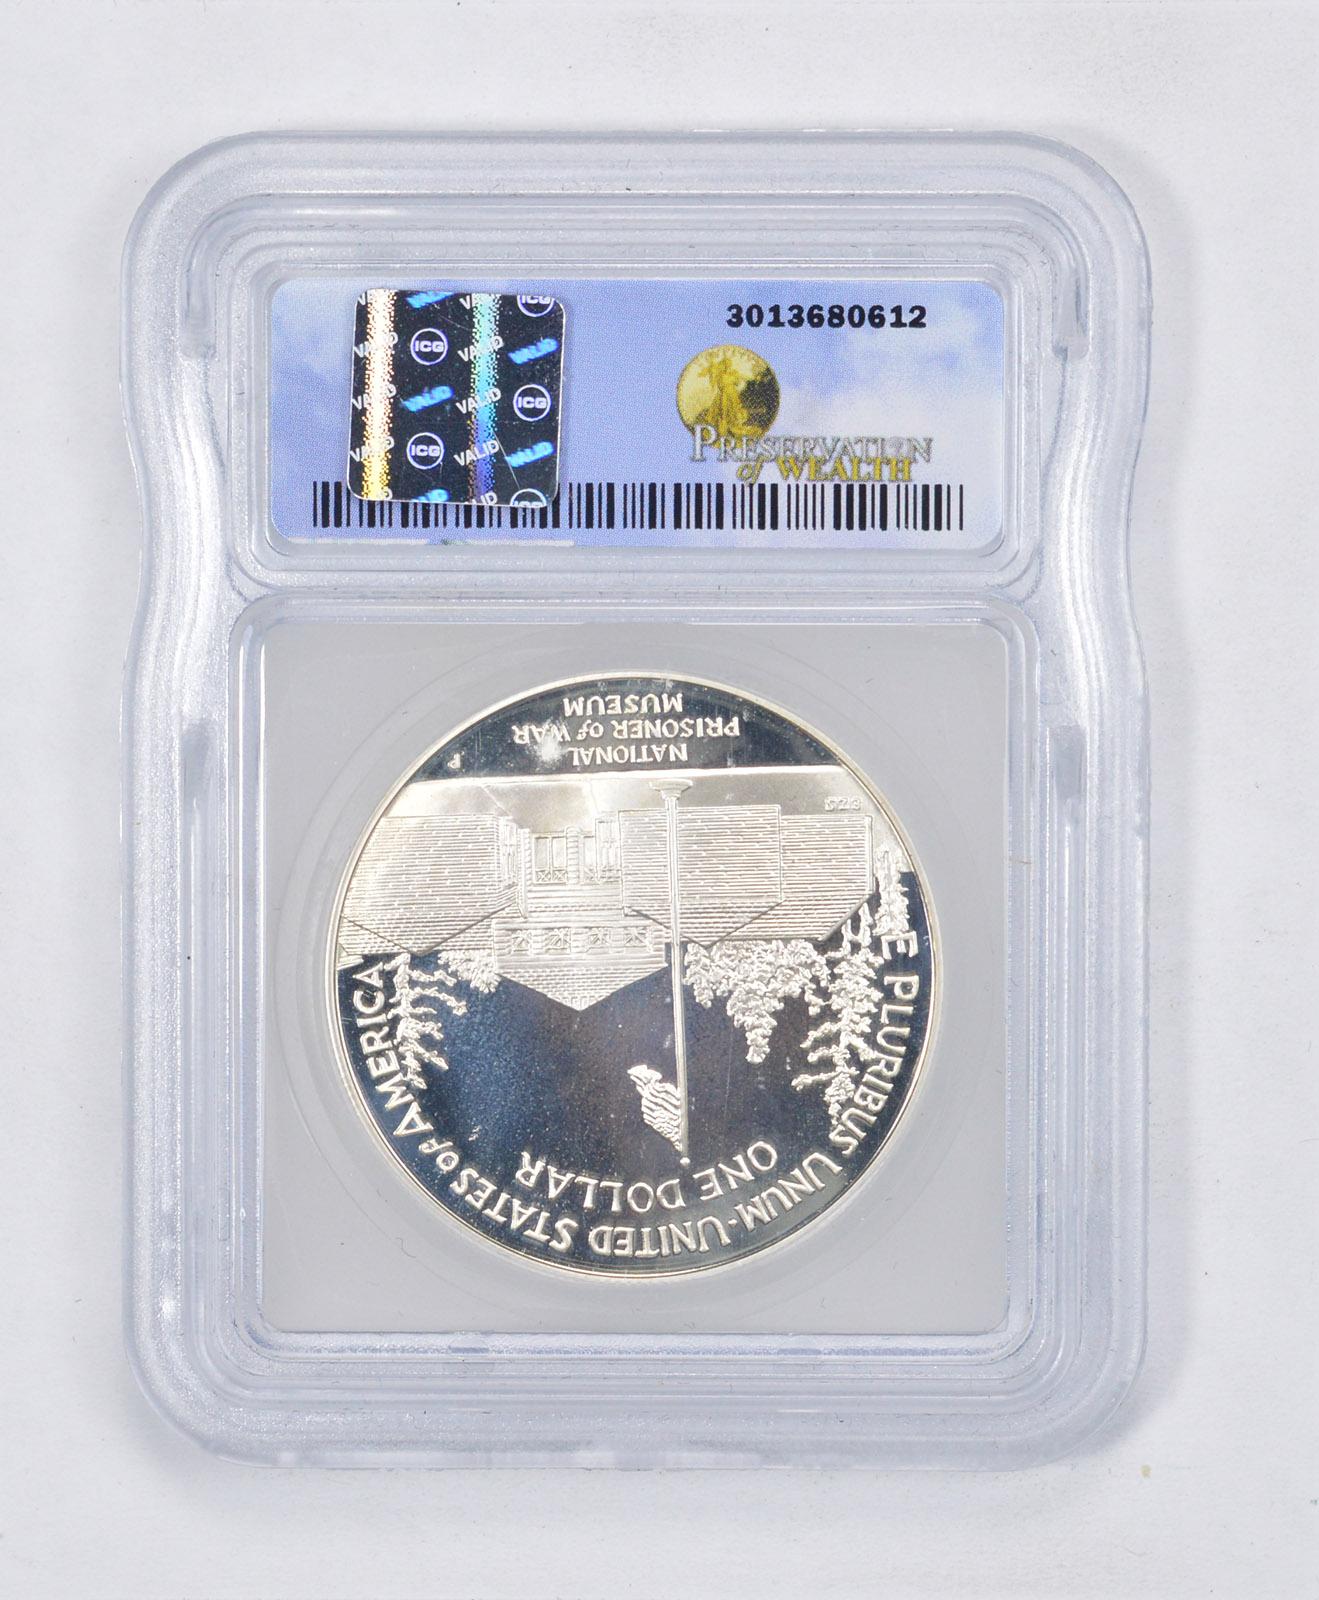 1994-P US Prisoner of War Commemorative Proof Silver Dollar PCGS PR69 DCAM